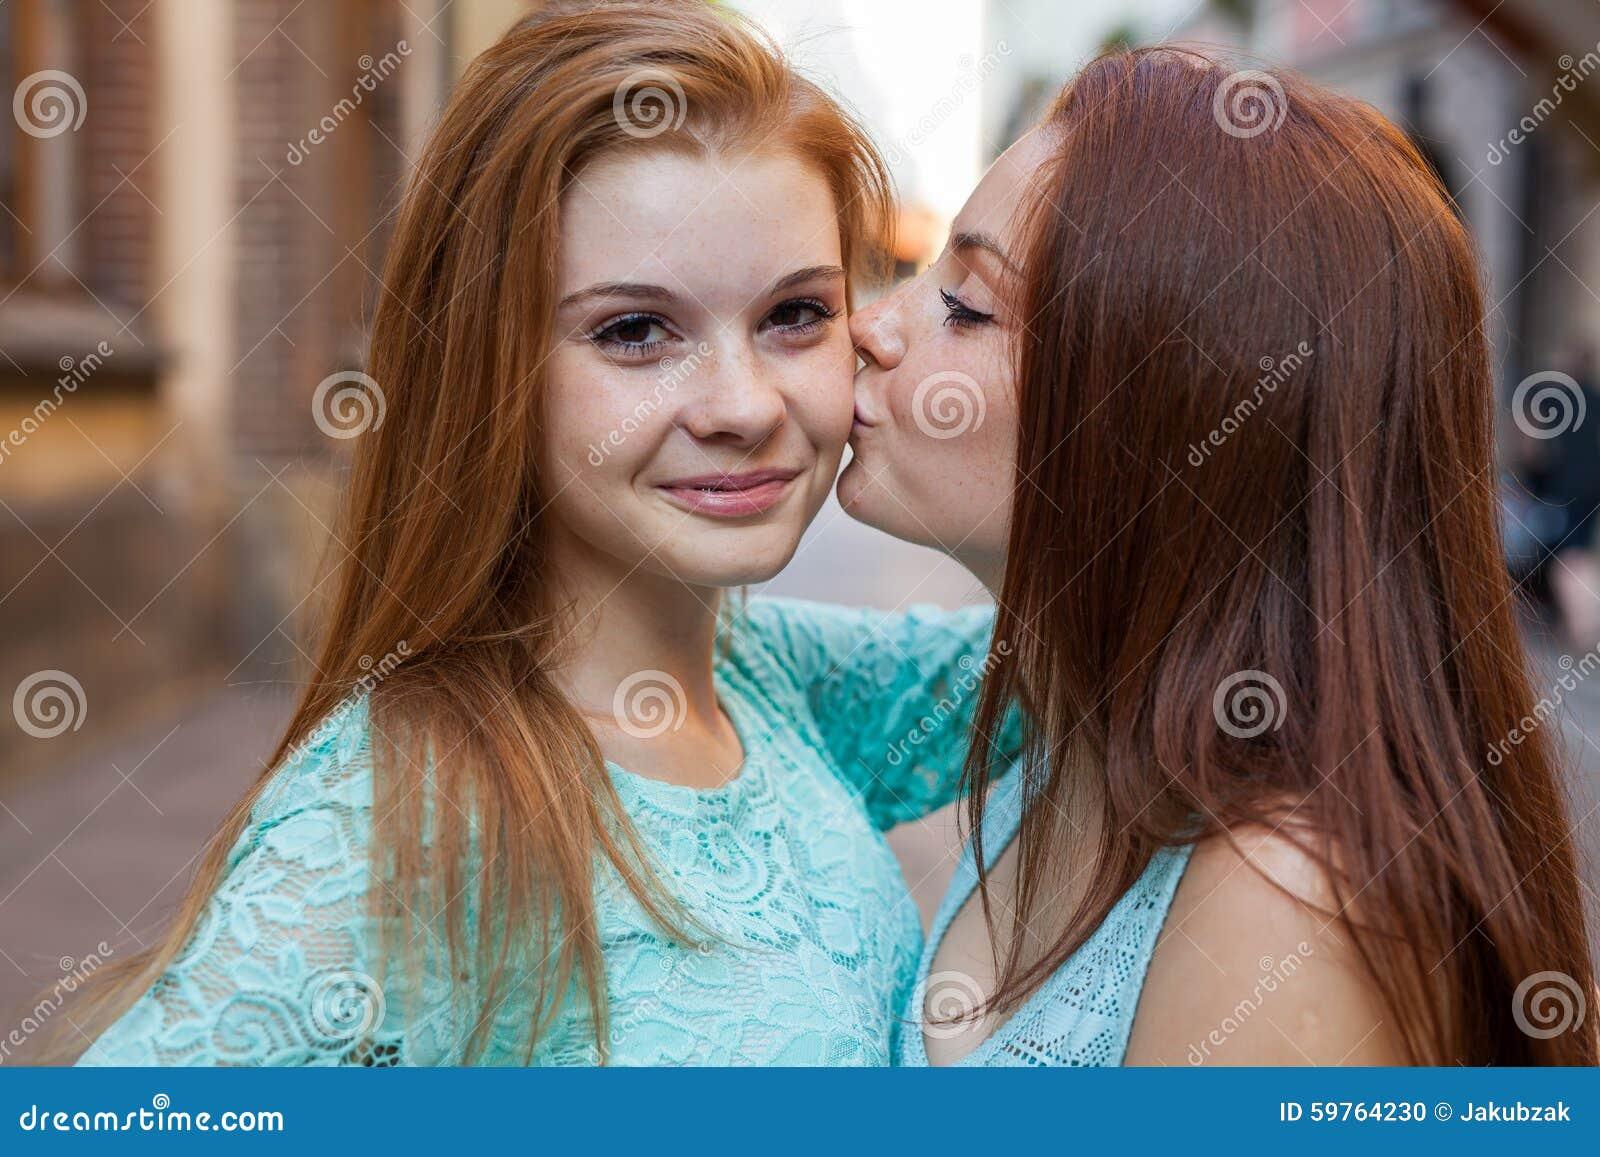 Japanese Two Girls Creampie